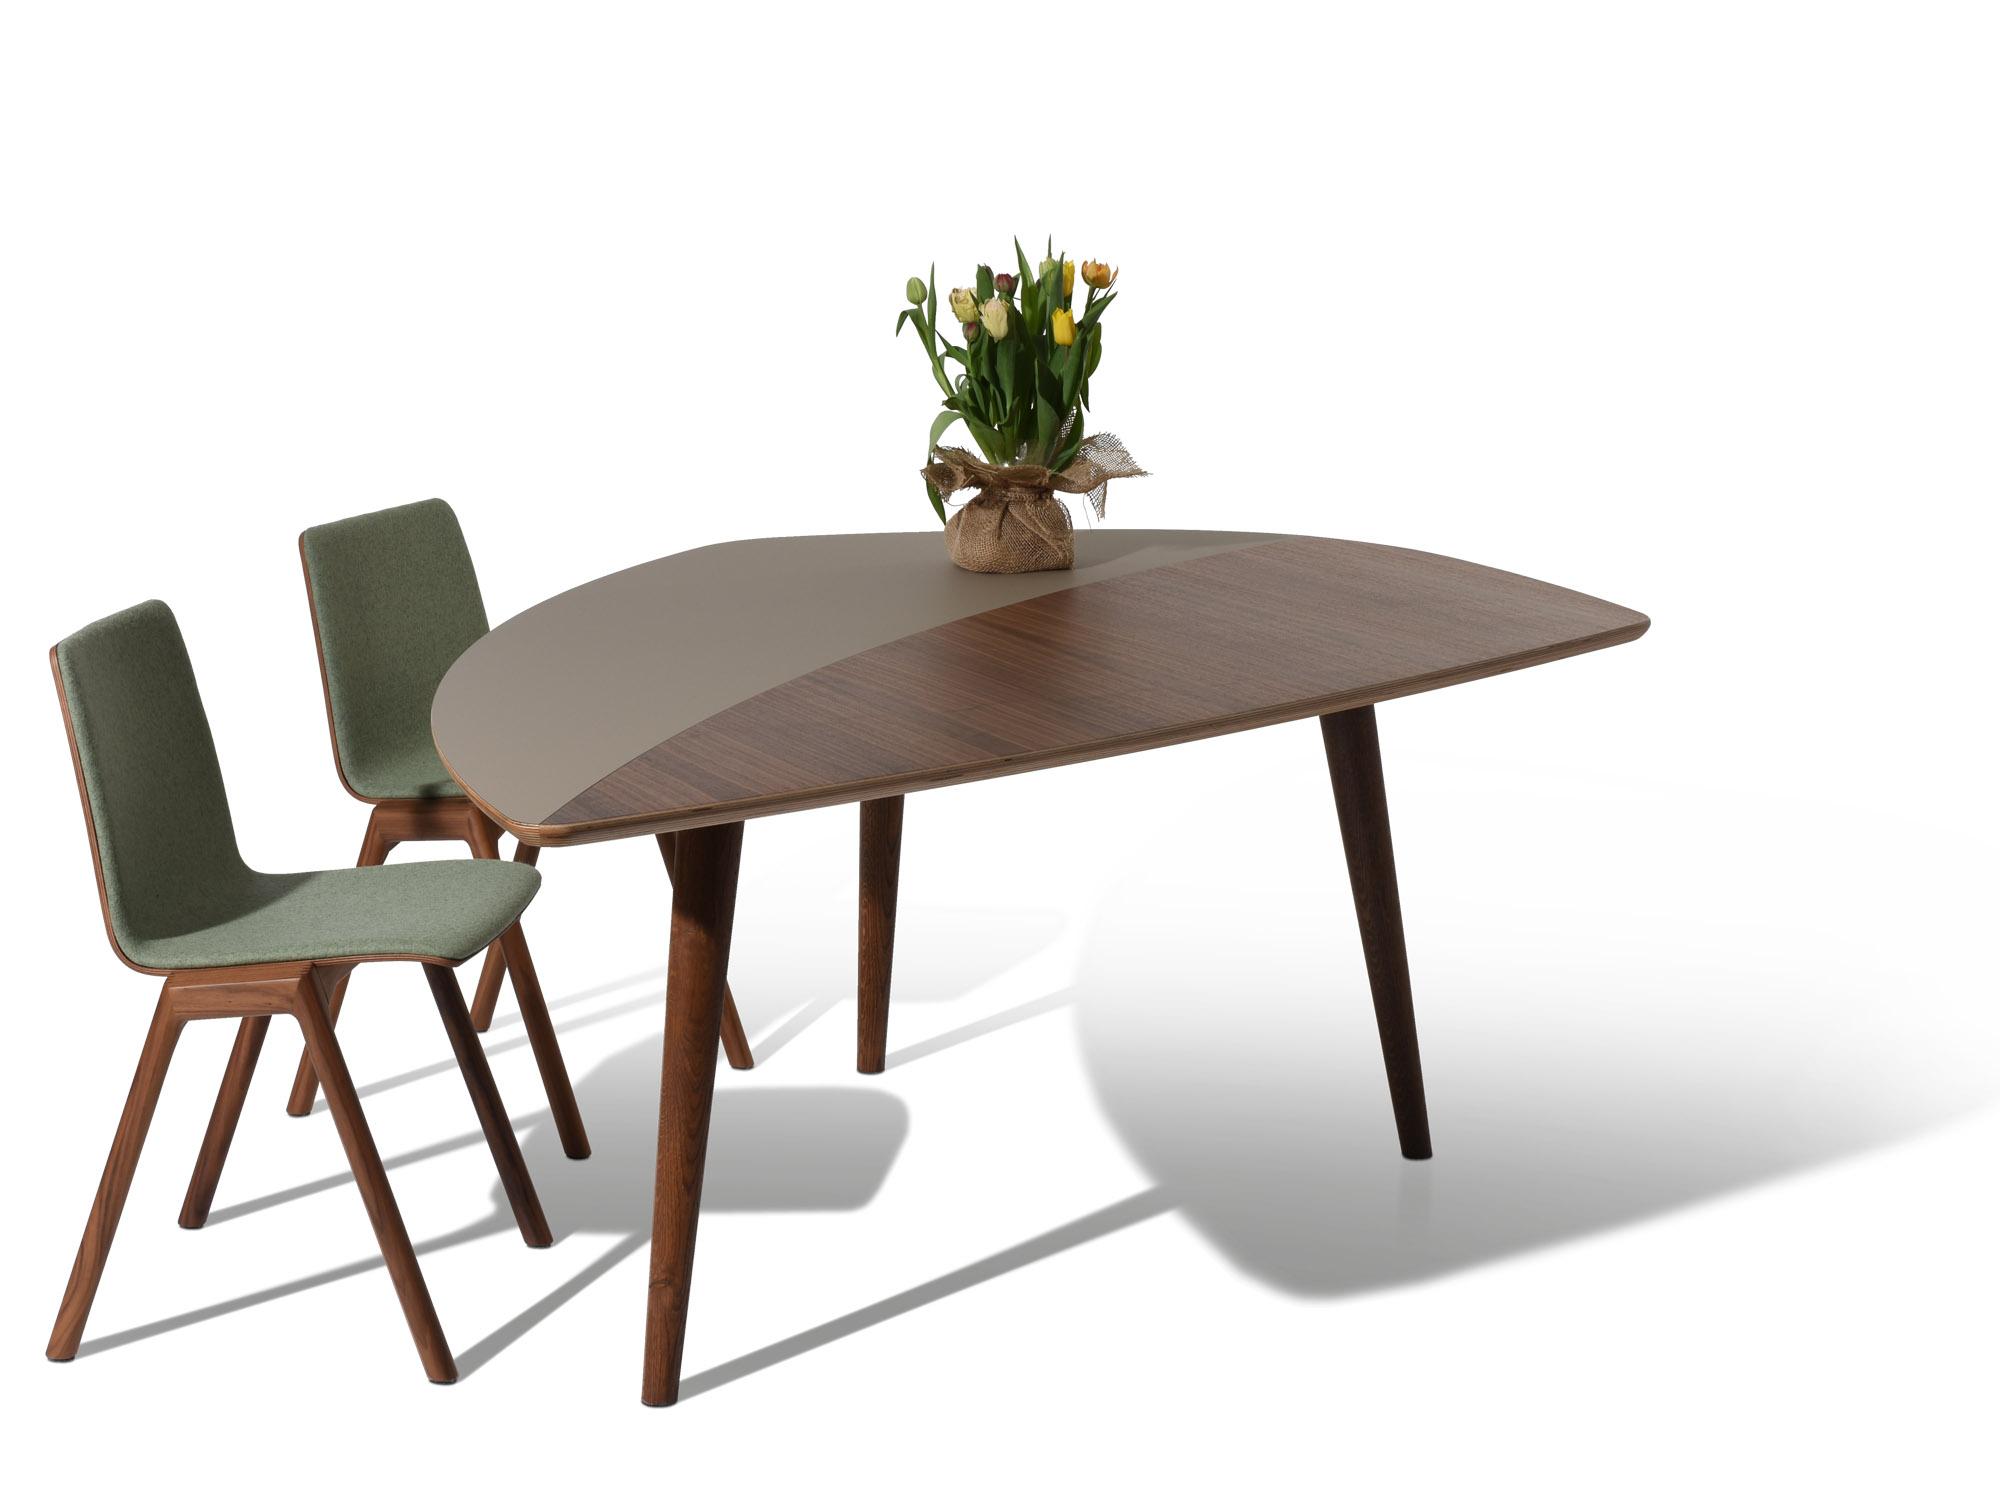 Castelijn RP bladvorm tafel - Design by Marieke Castelijn